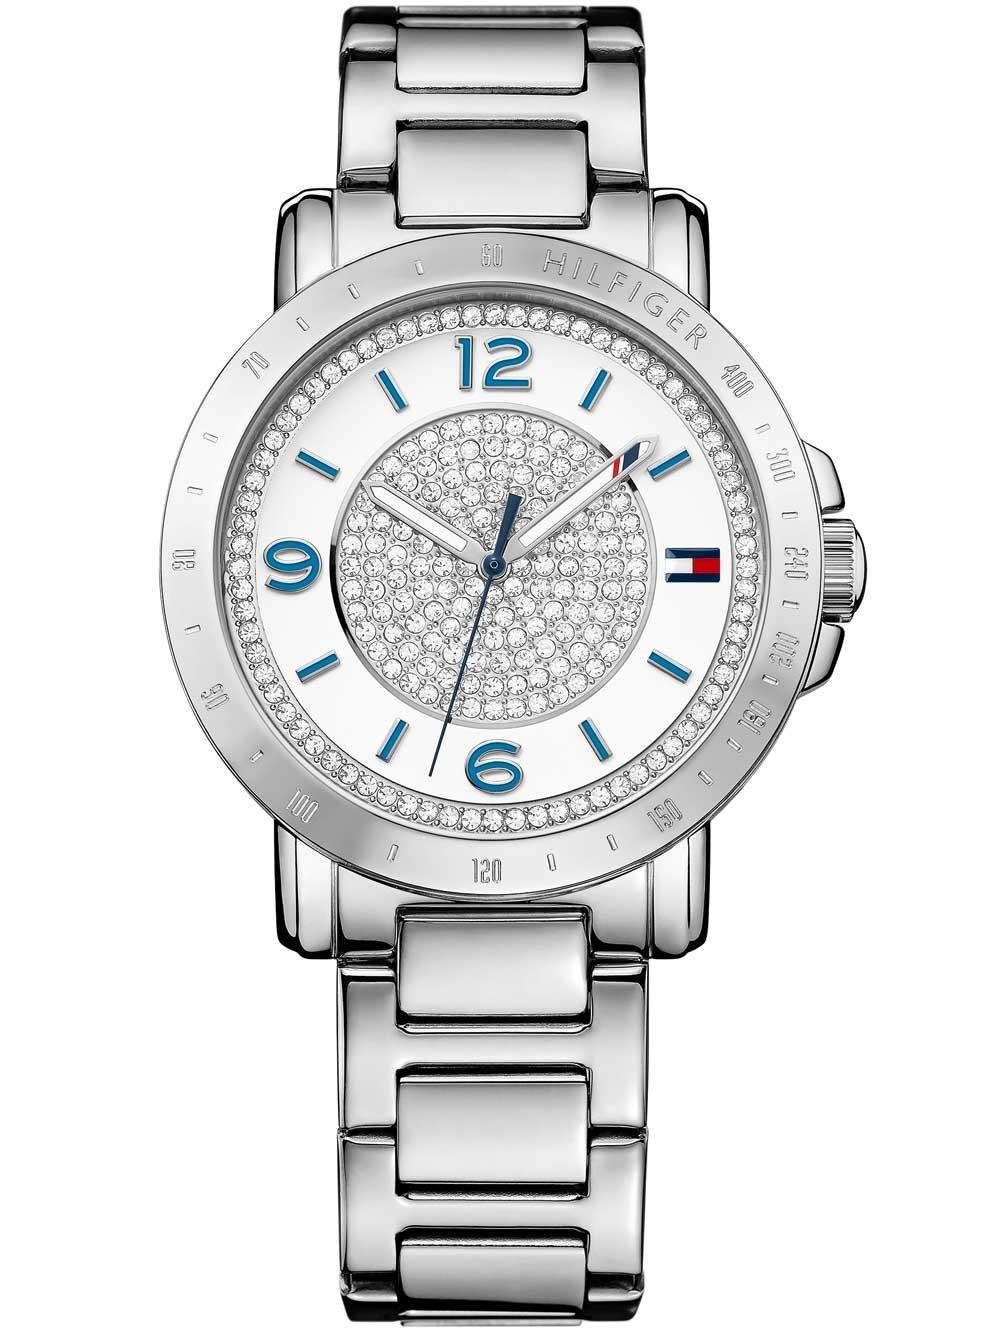 watches chrono12 tommy hilfiger 1781622 damenuhr 34mm 3atm. Black Bedroom Furniture Sets. Home Design Ideas